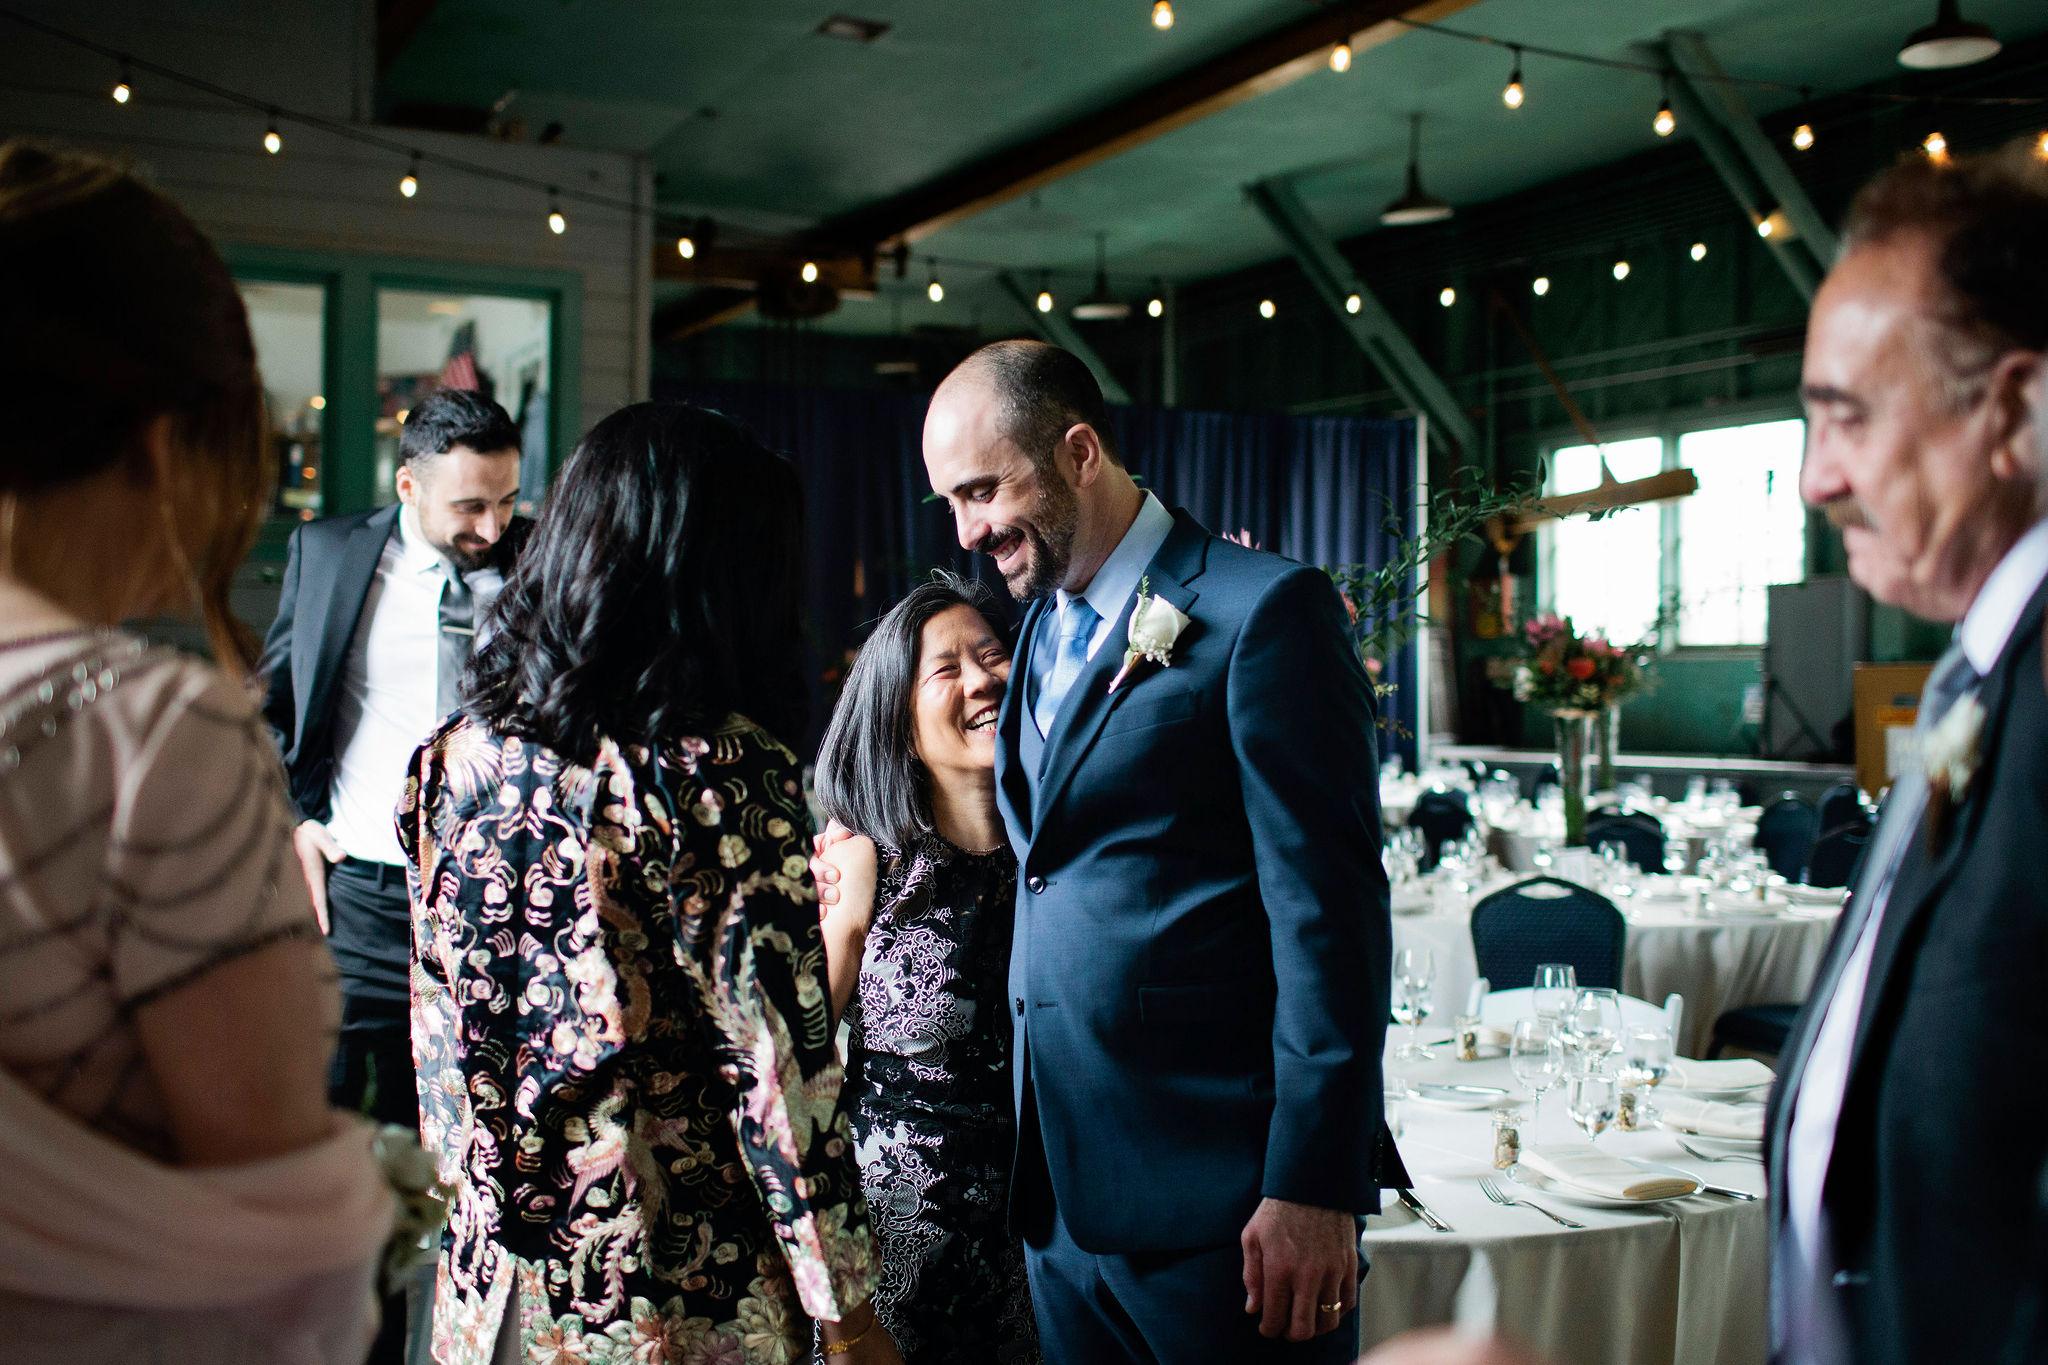 Presidio-Yacht-Club-Wedding-060.JPG